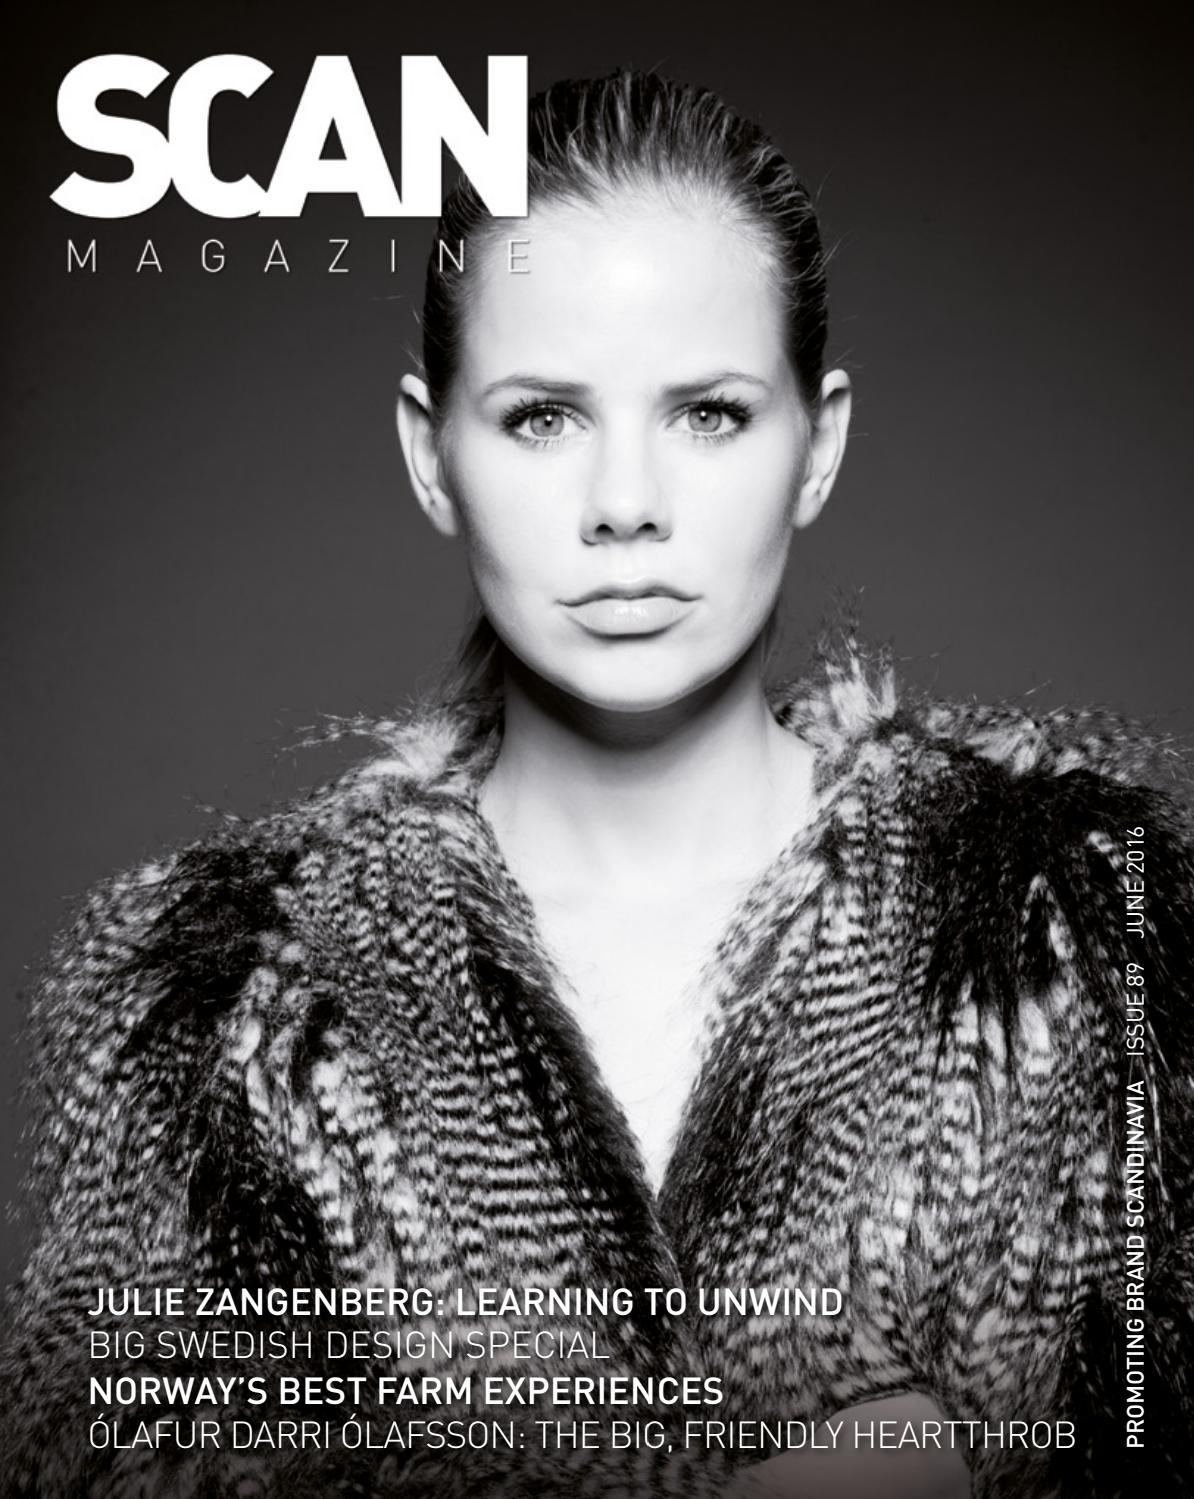 Scan Magazine 3fddeca25e2c